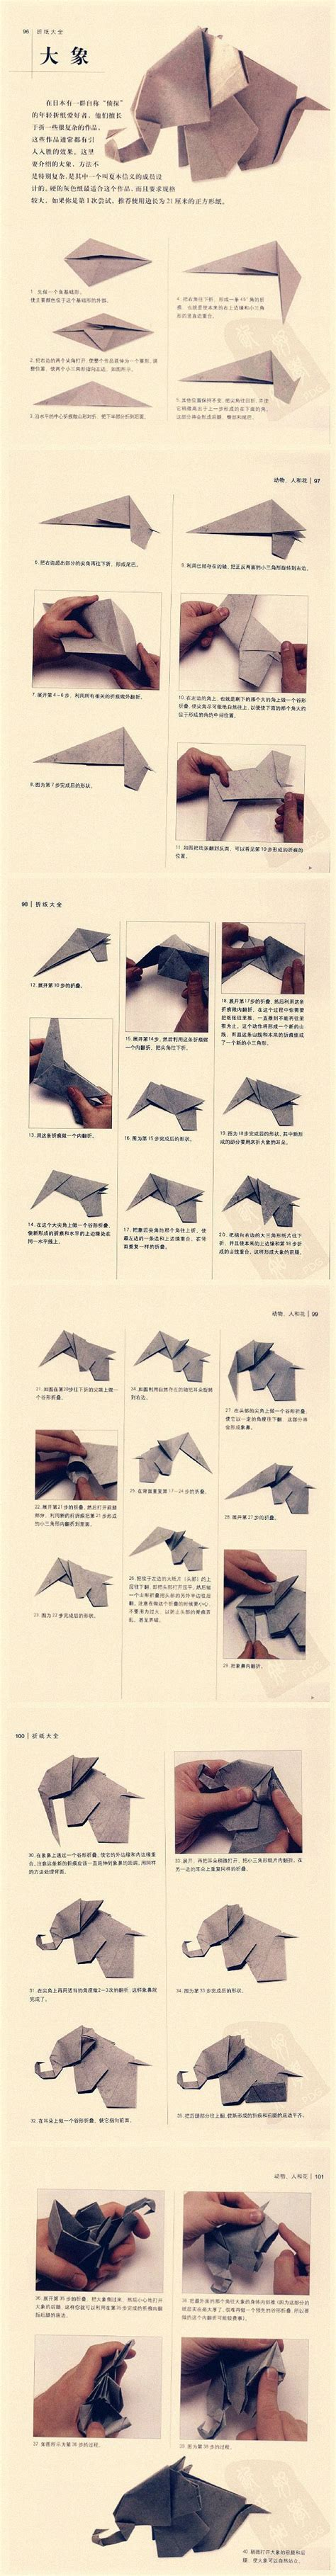 Best Origami Designs - origami best origami elephant ideas on origami mobile